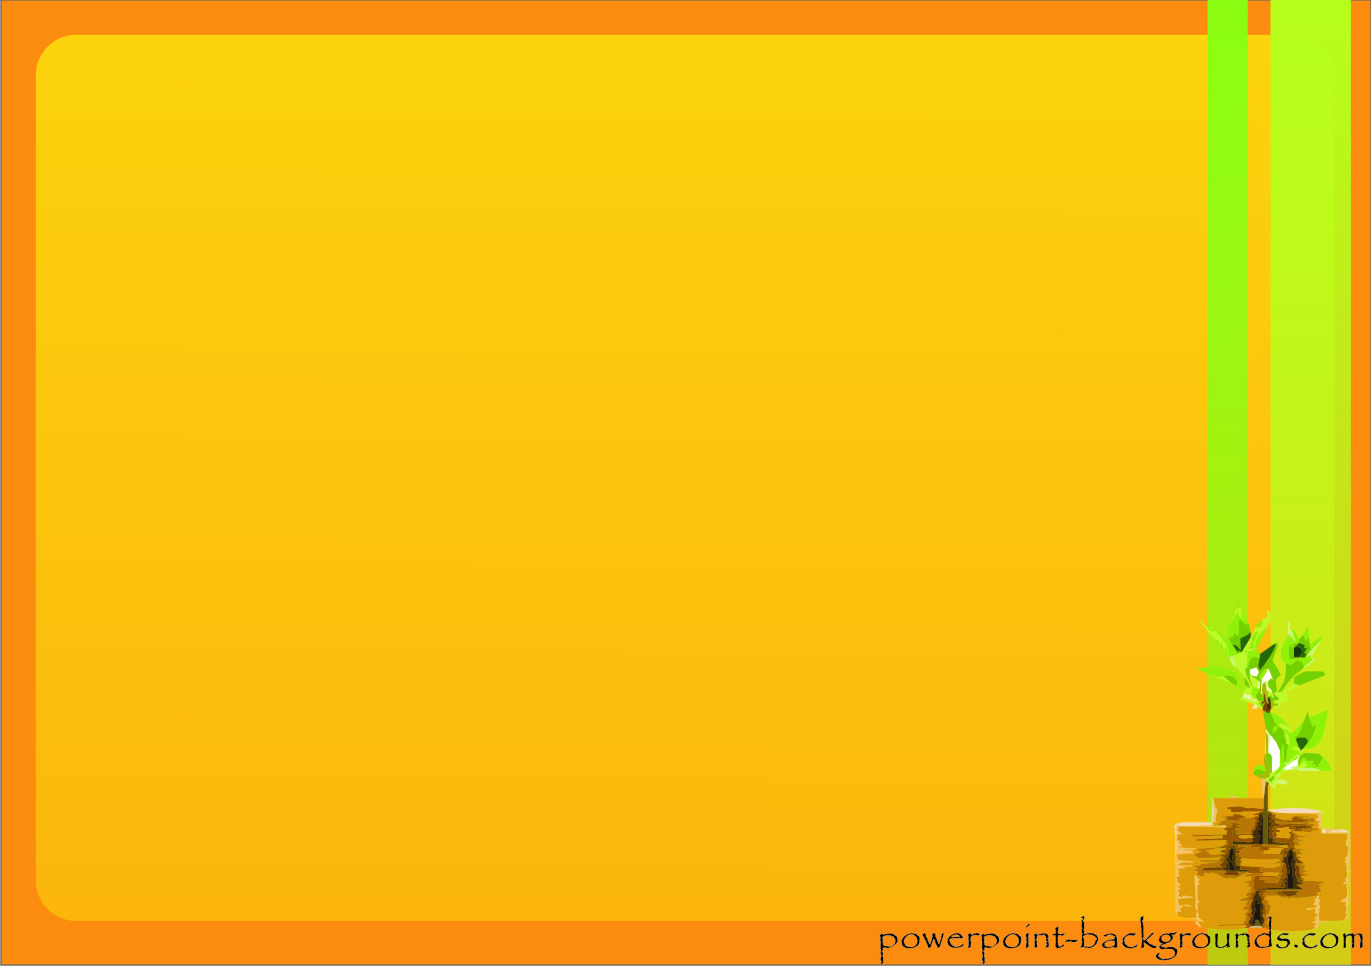 background design for powerpoint presentation